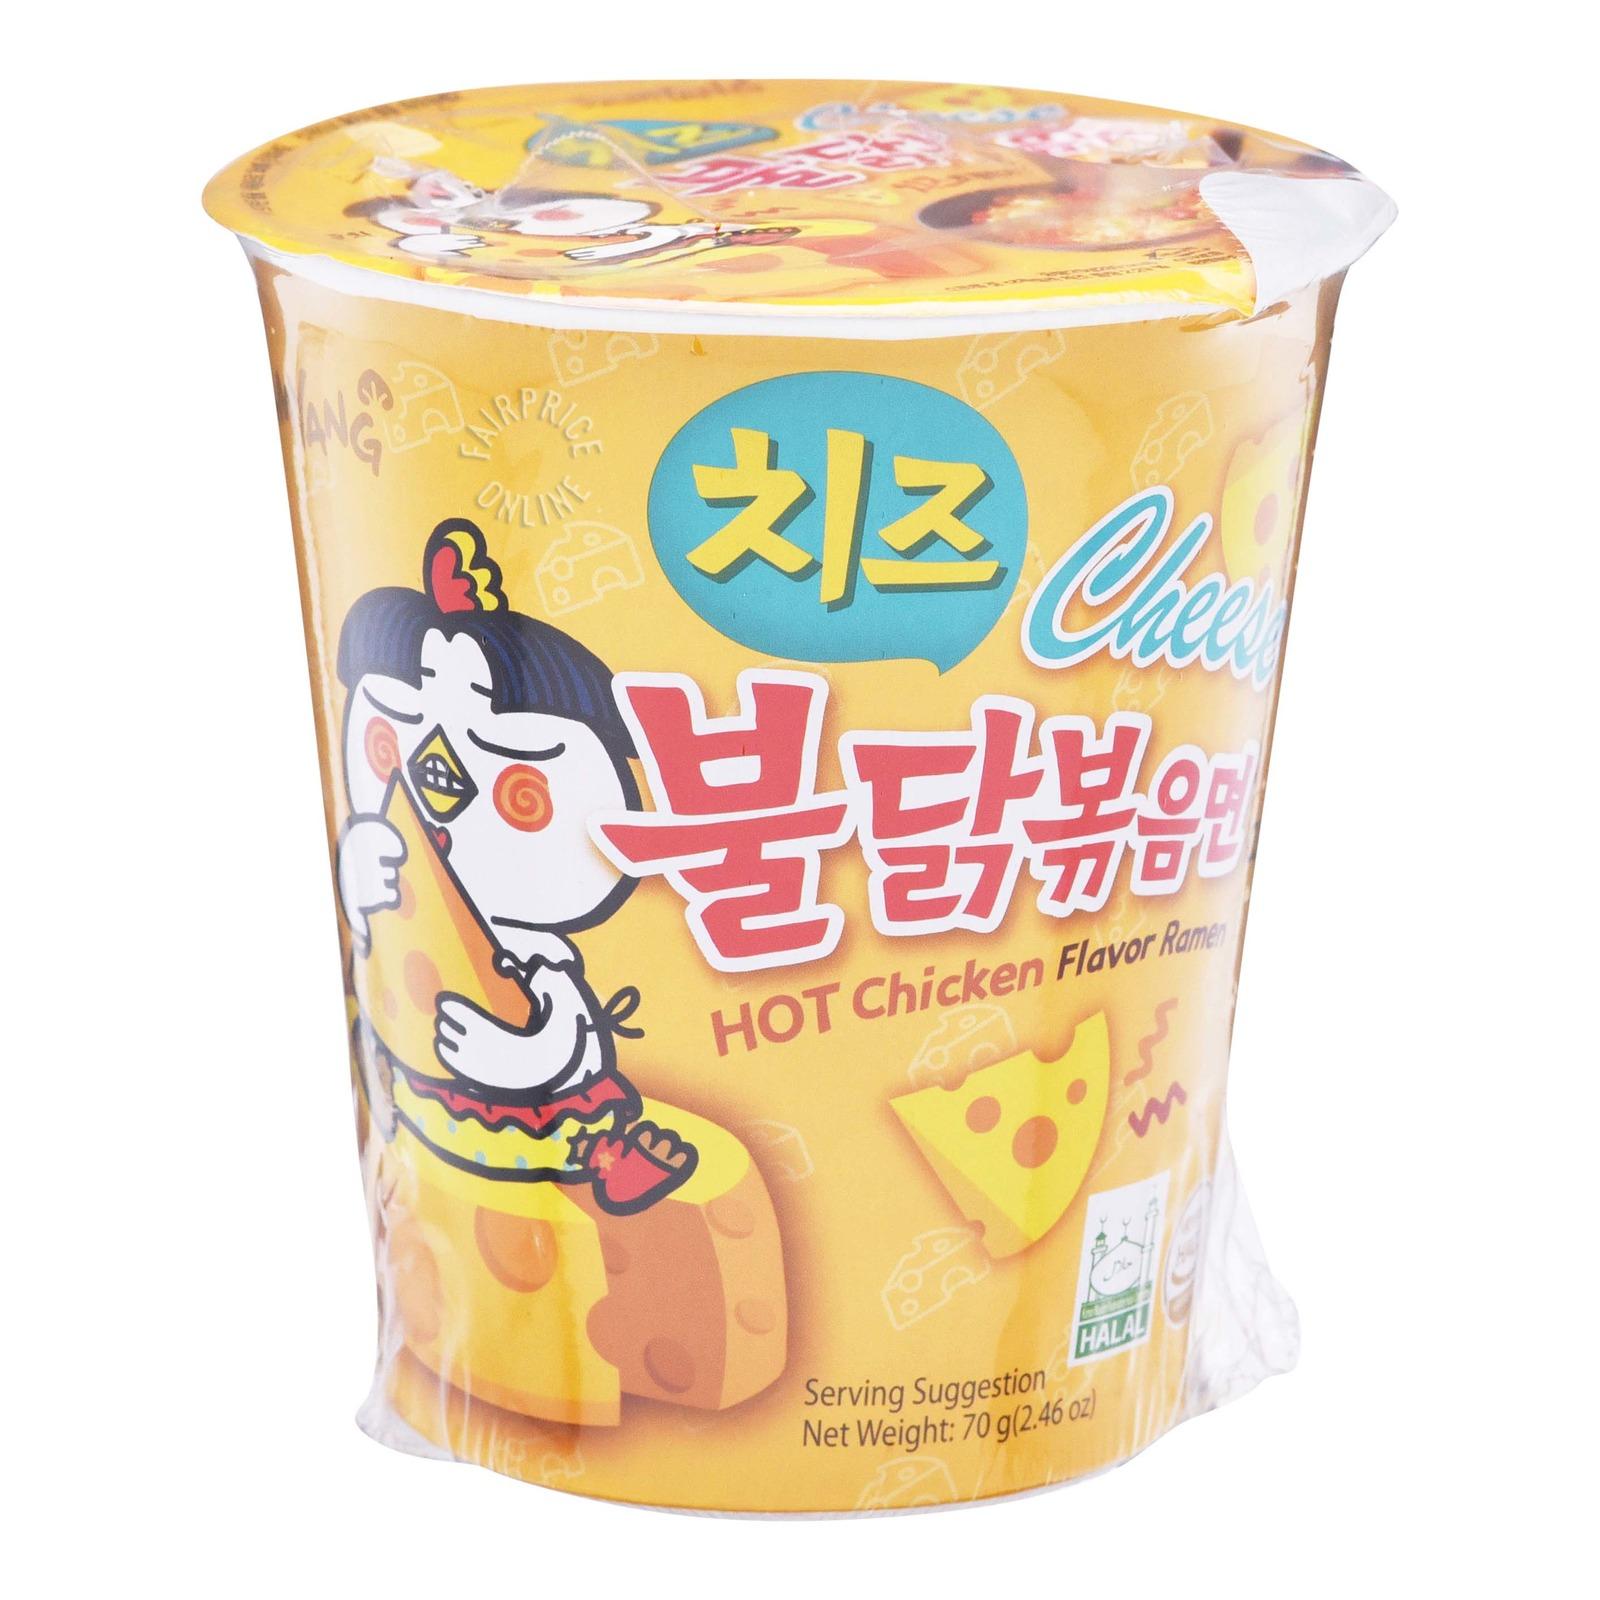 Samyang Hot Chicken Instant Ramen - Cheese (Cup)